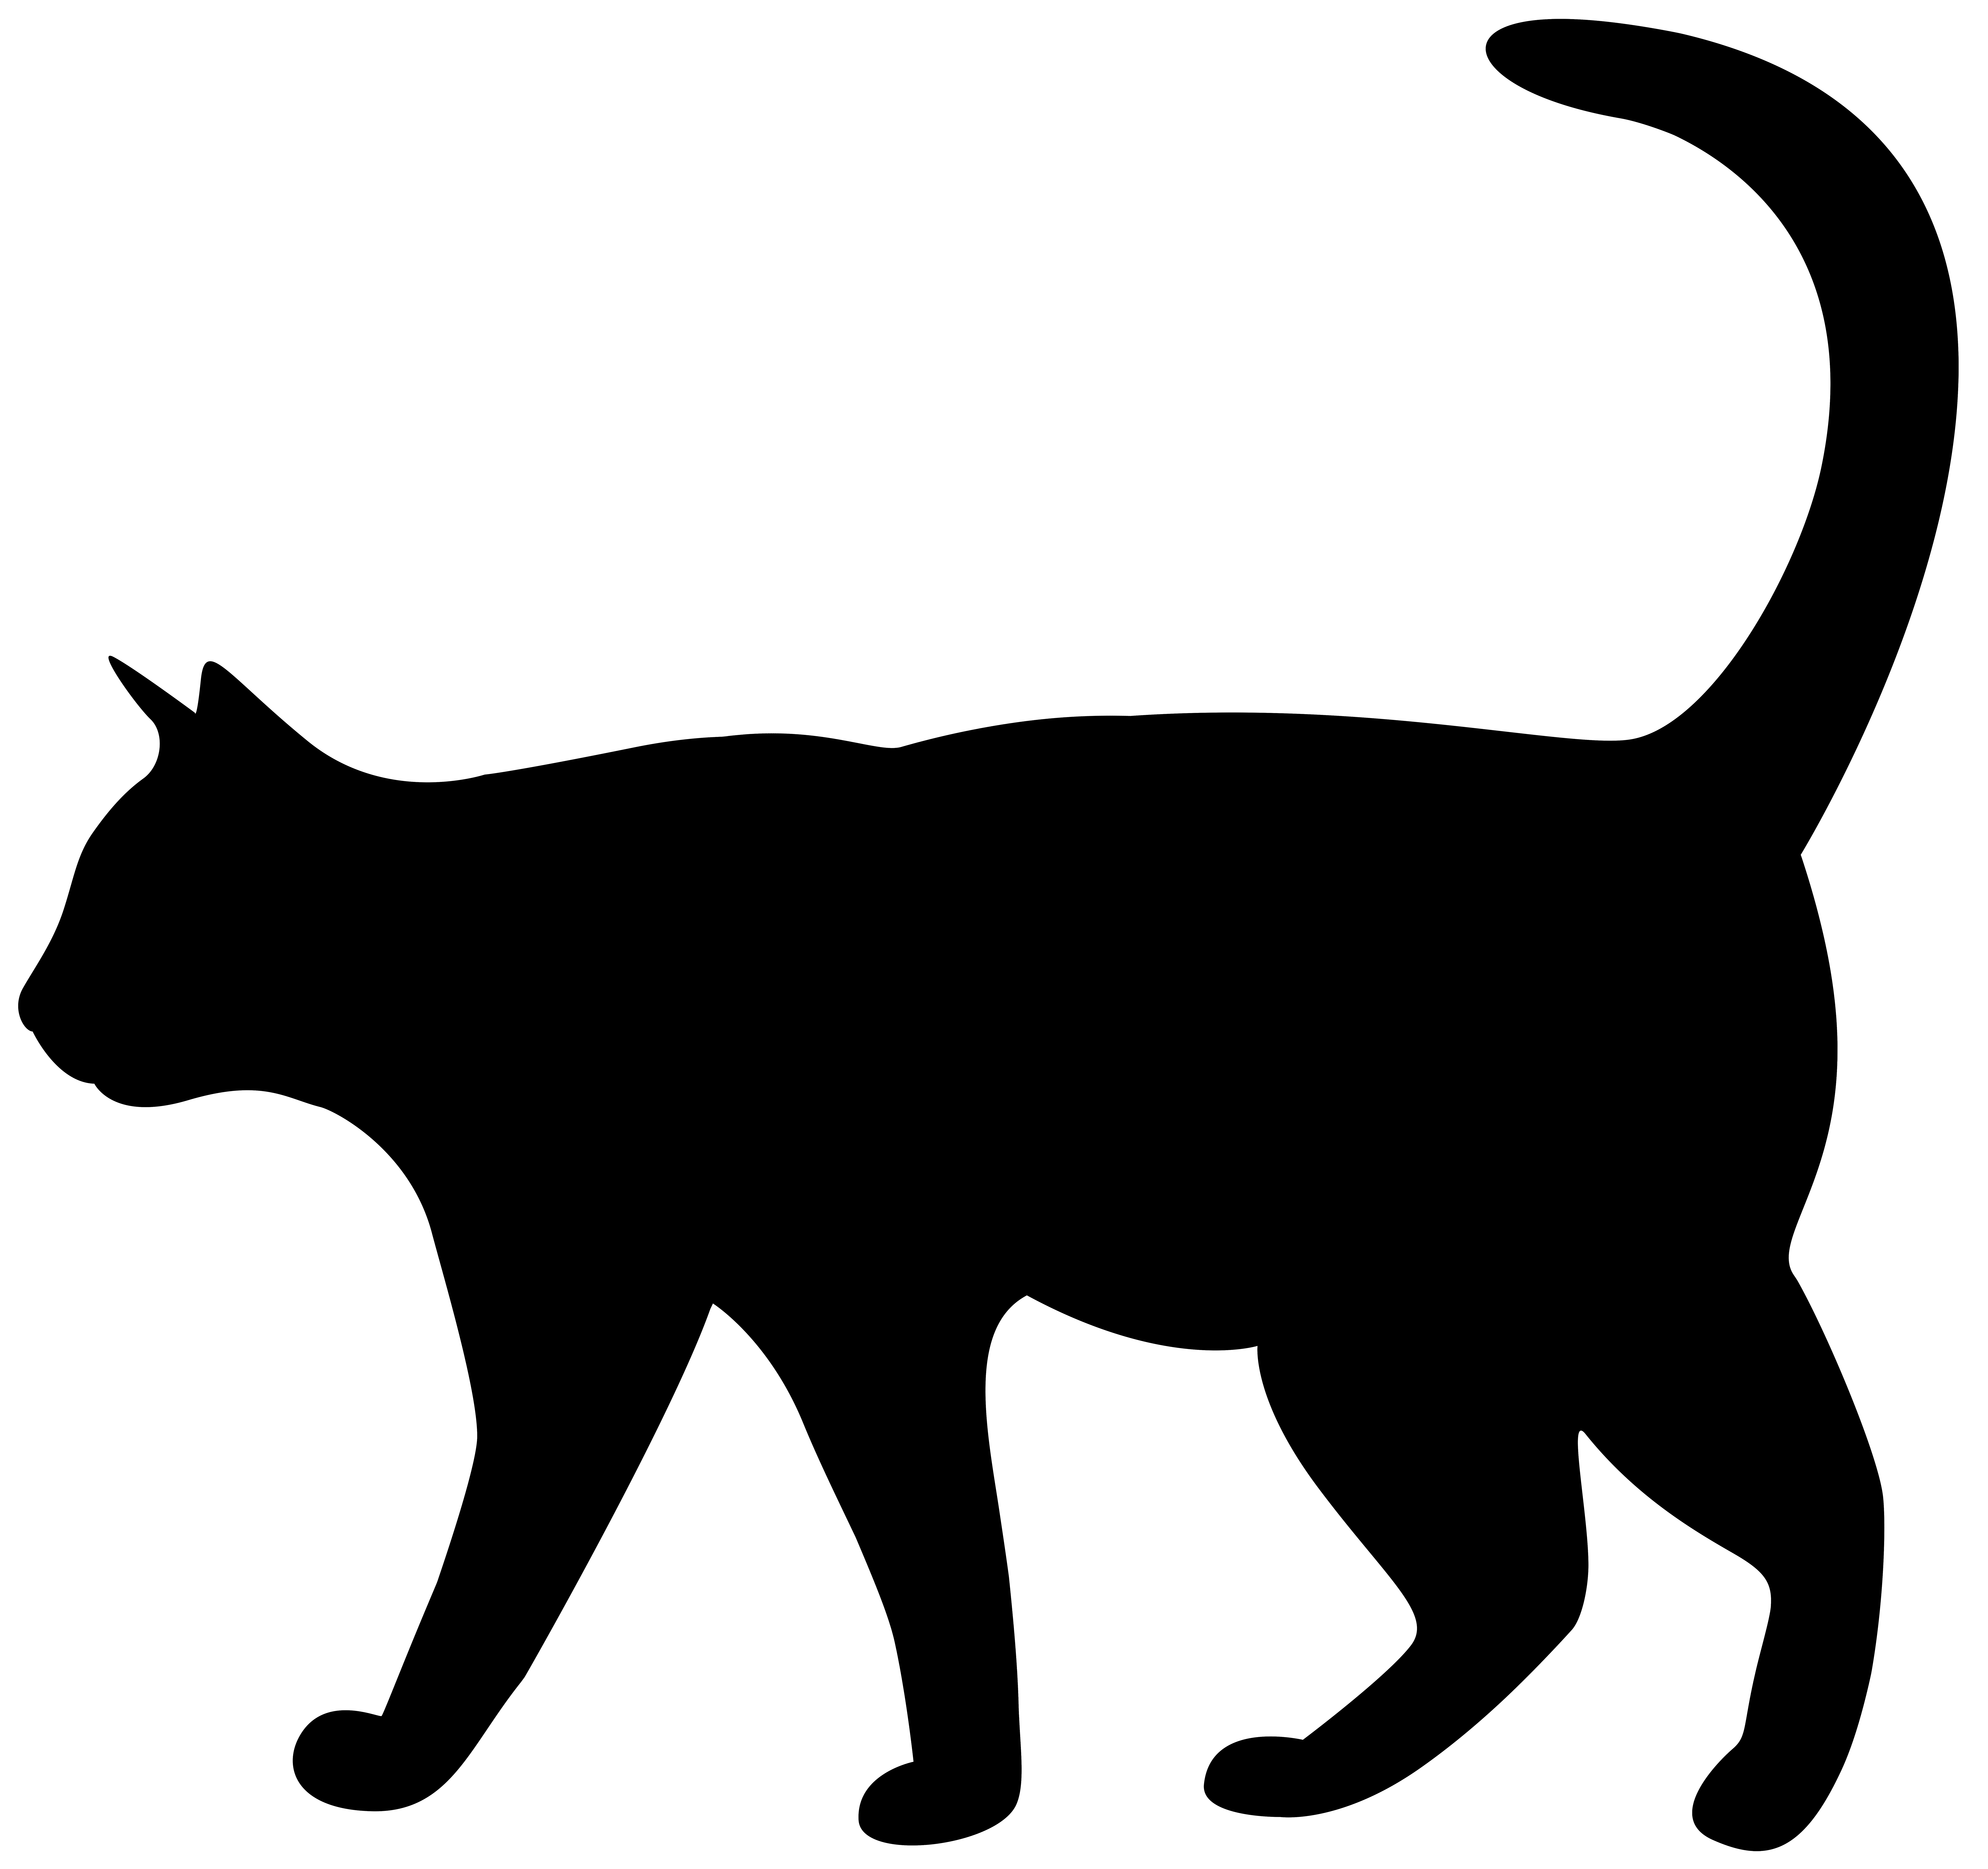 Cat clipart clear background. Transparent portal